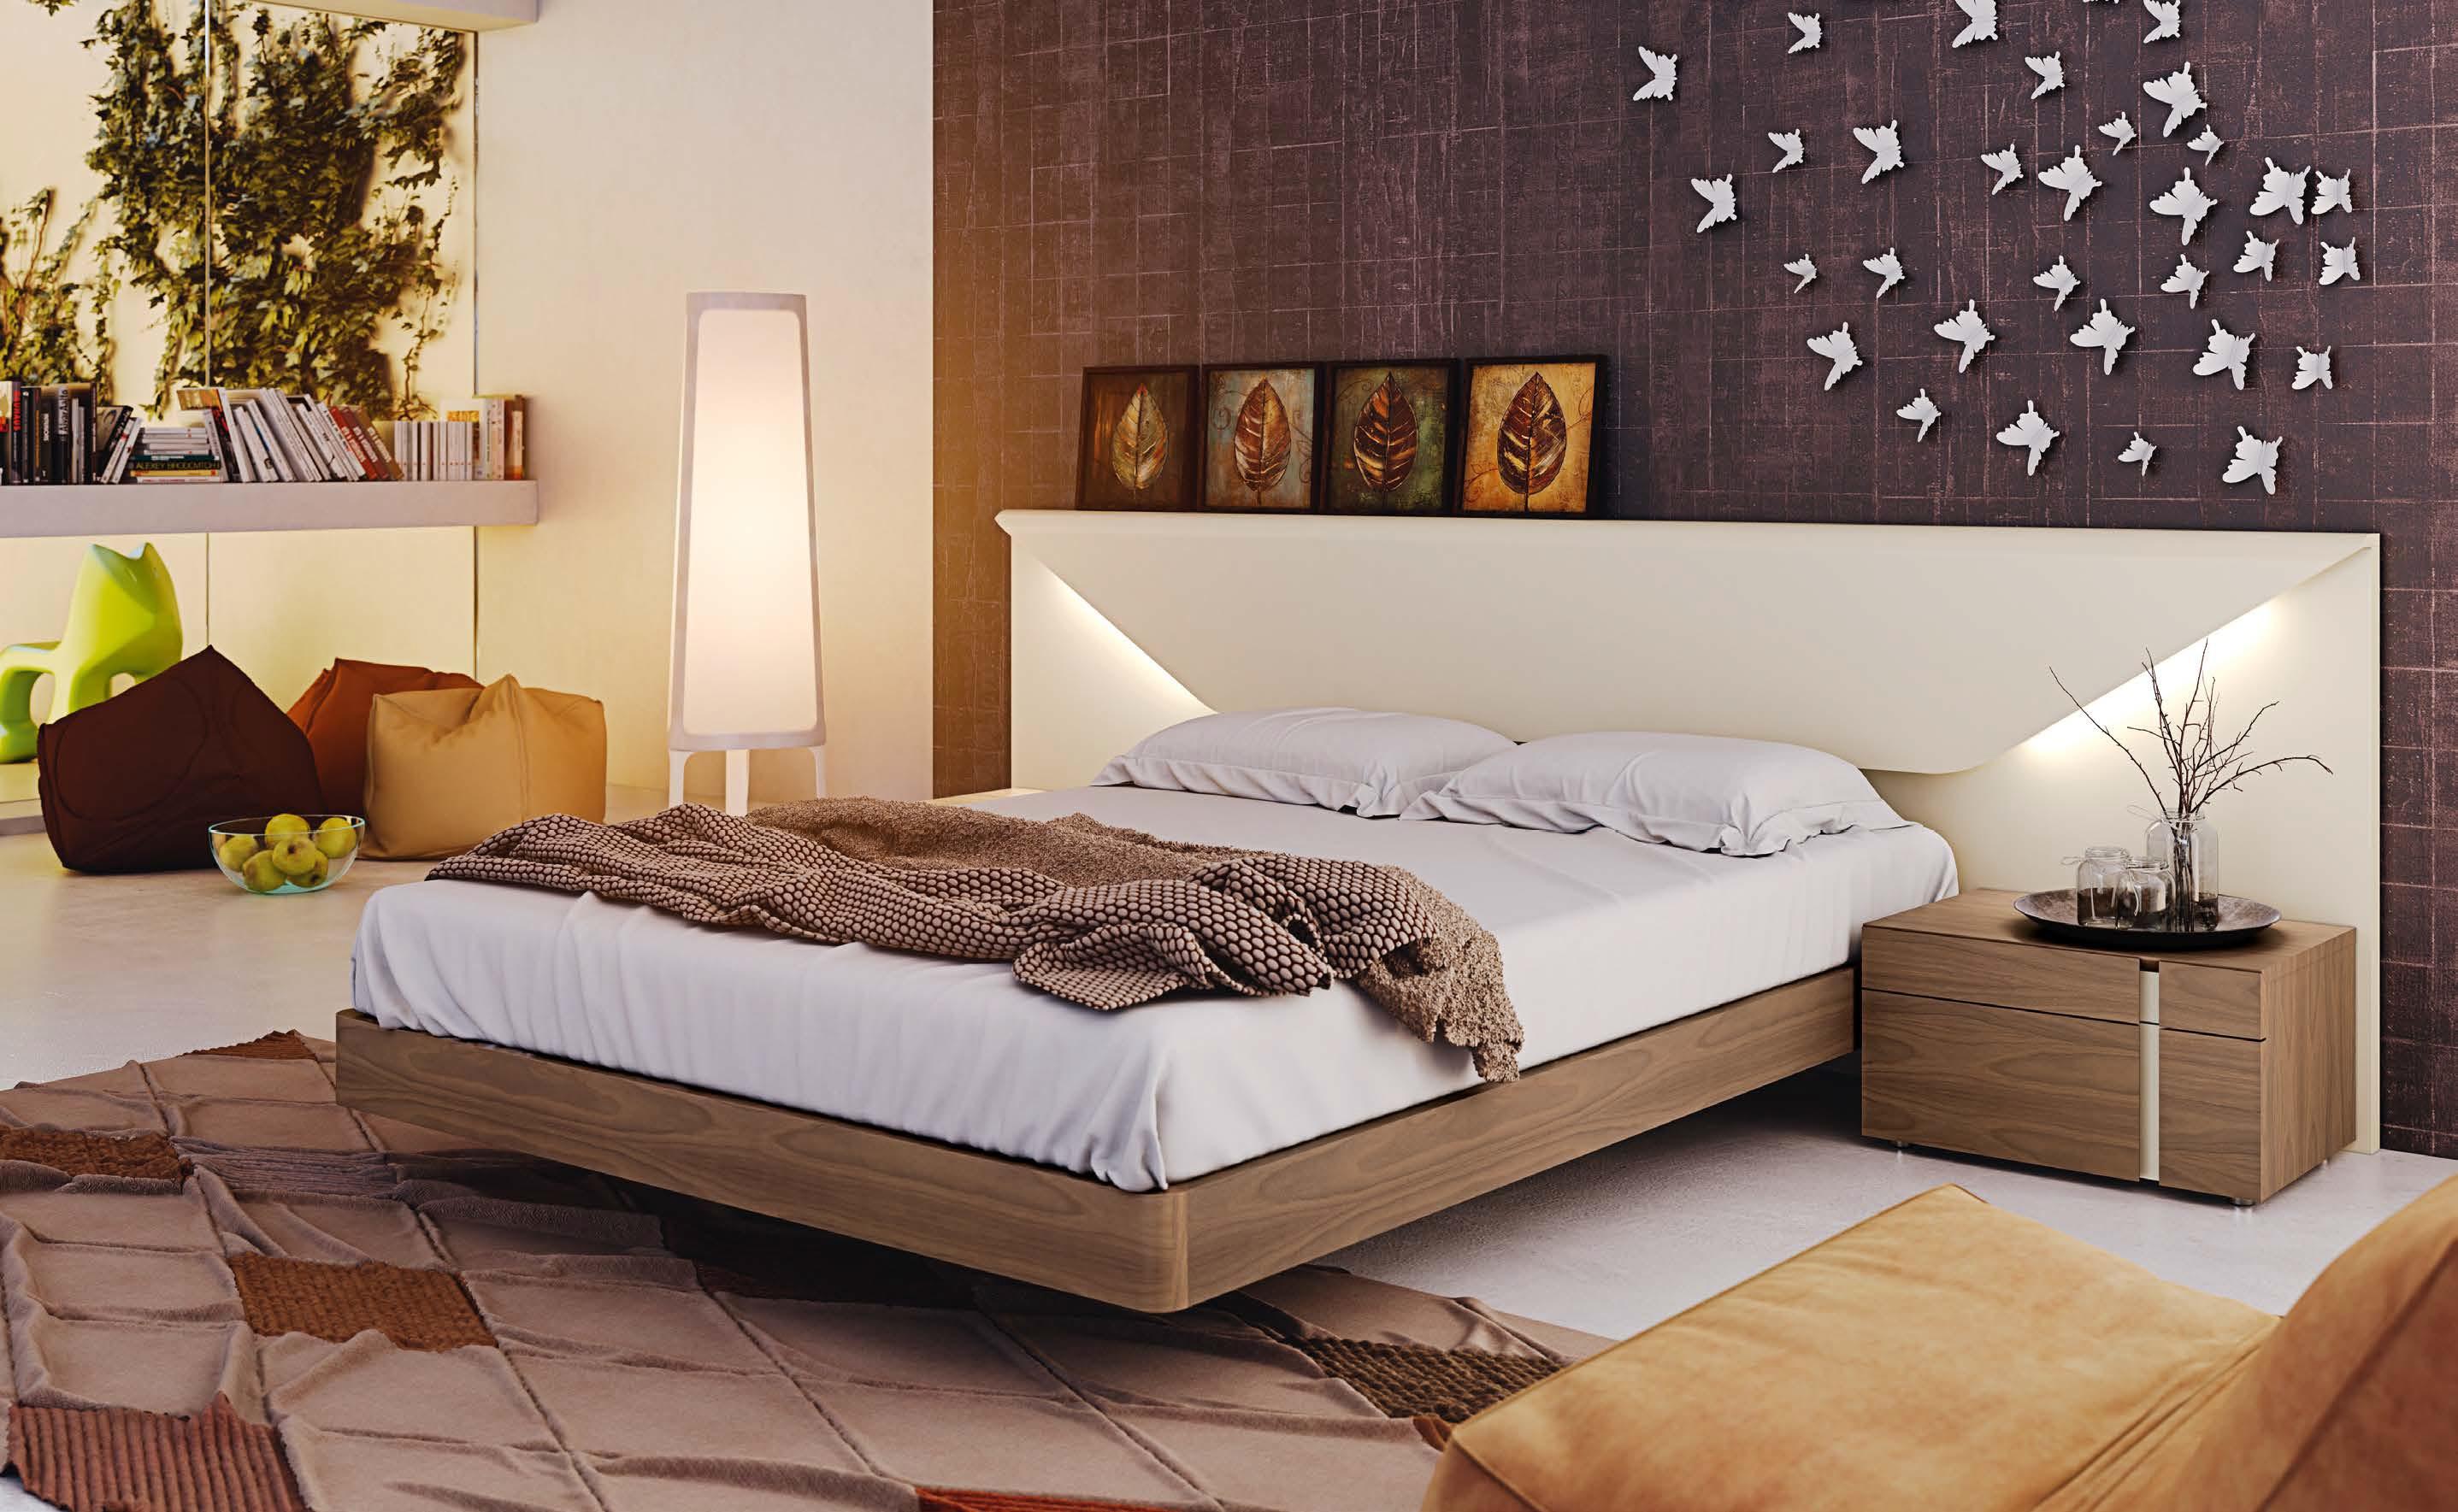 moderno-1-YOU-AND-ME-muebles-paco-caballero-633-5c9cfce378902